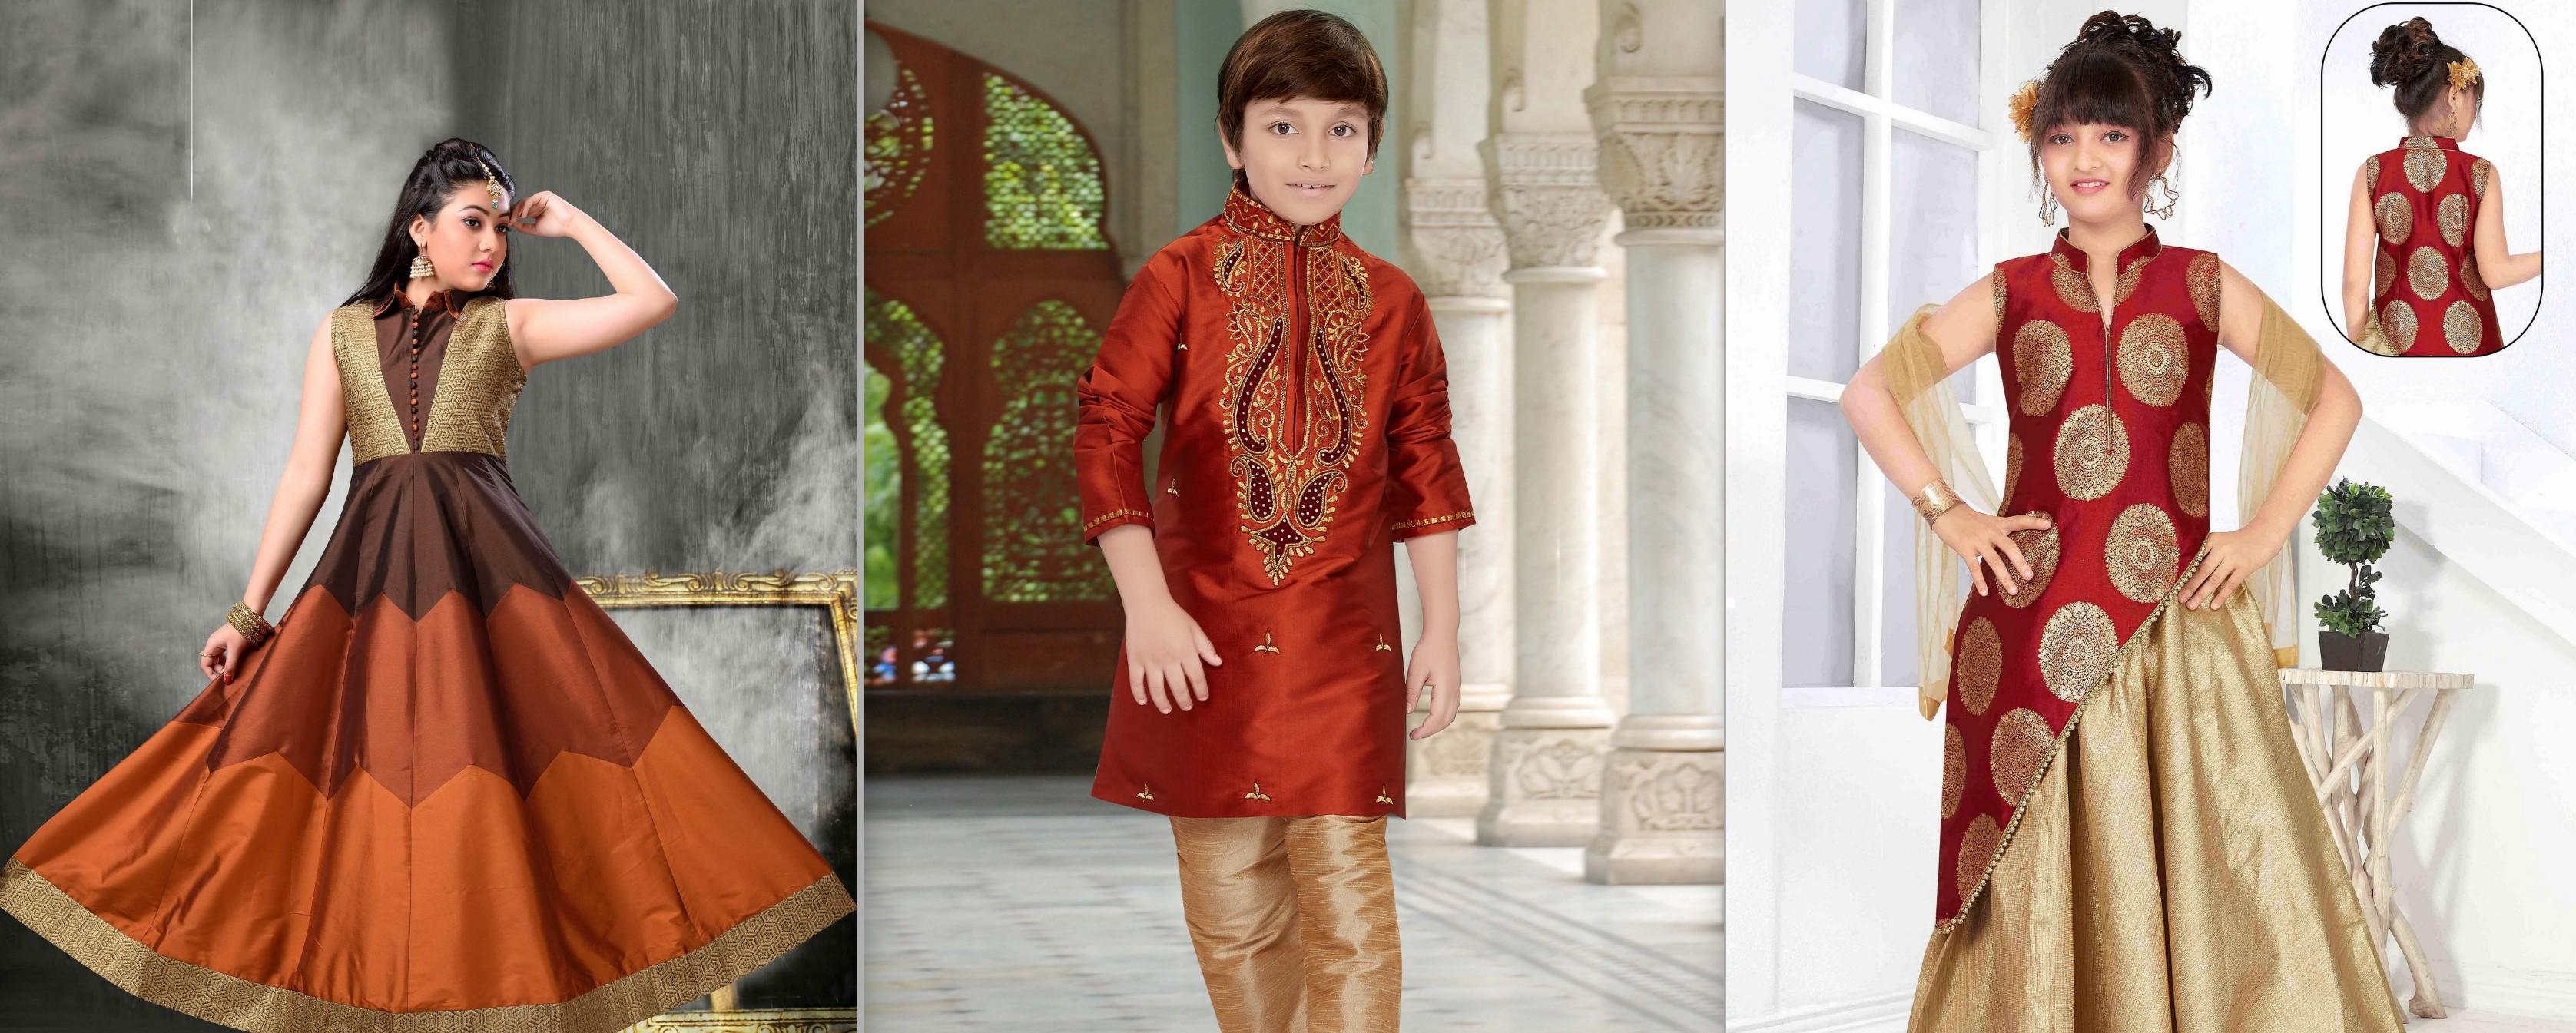 Buy Indian Ethnic Wear Online  6e8930f8d49